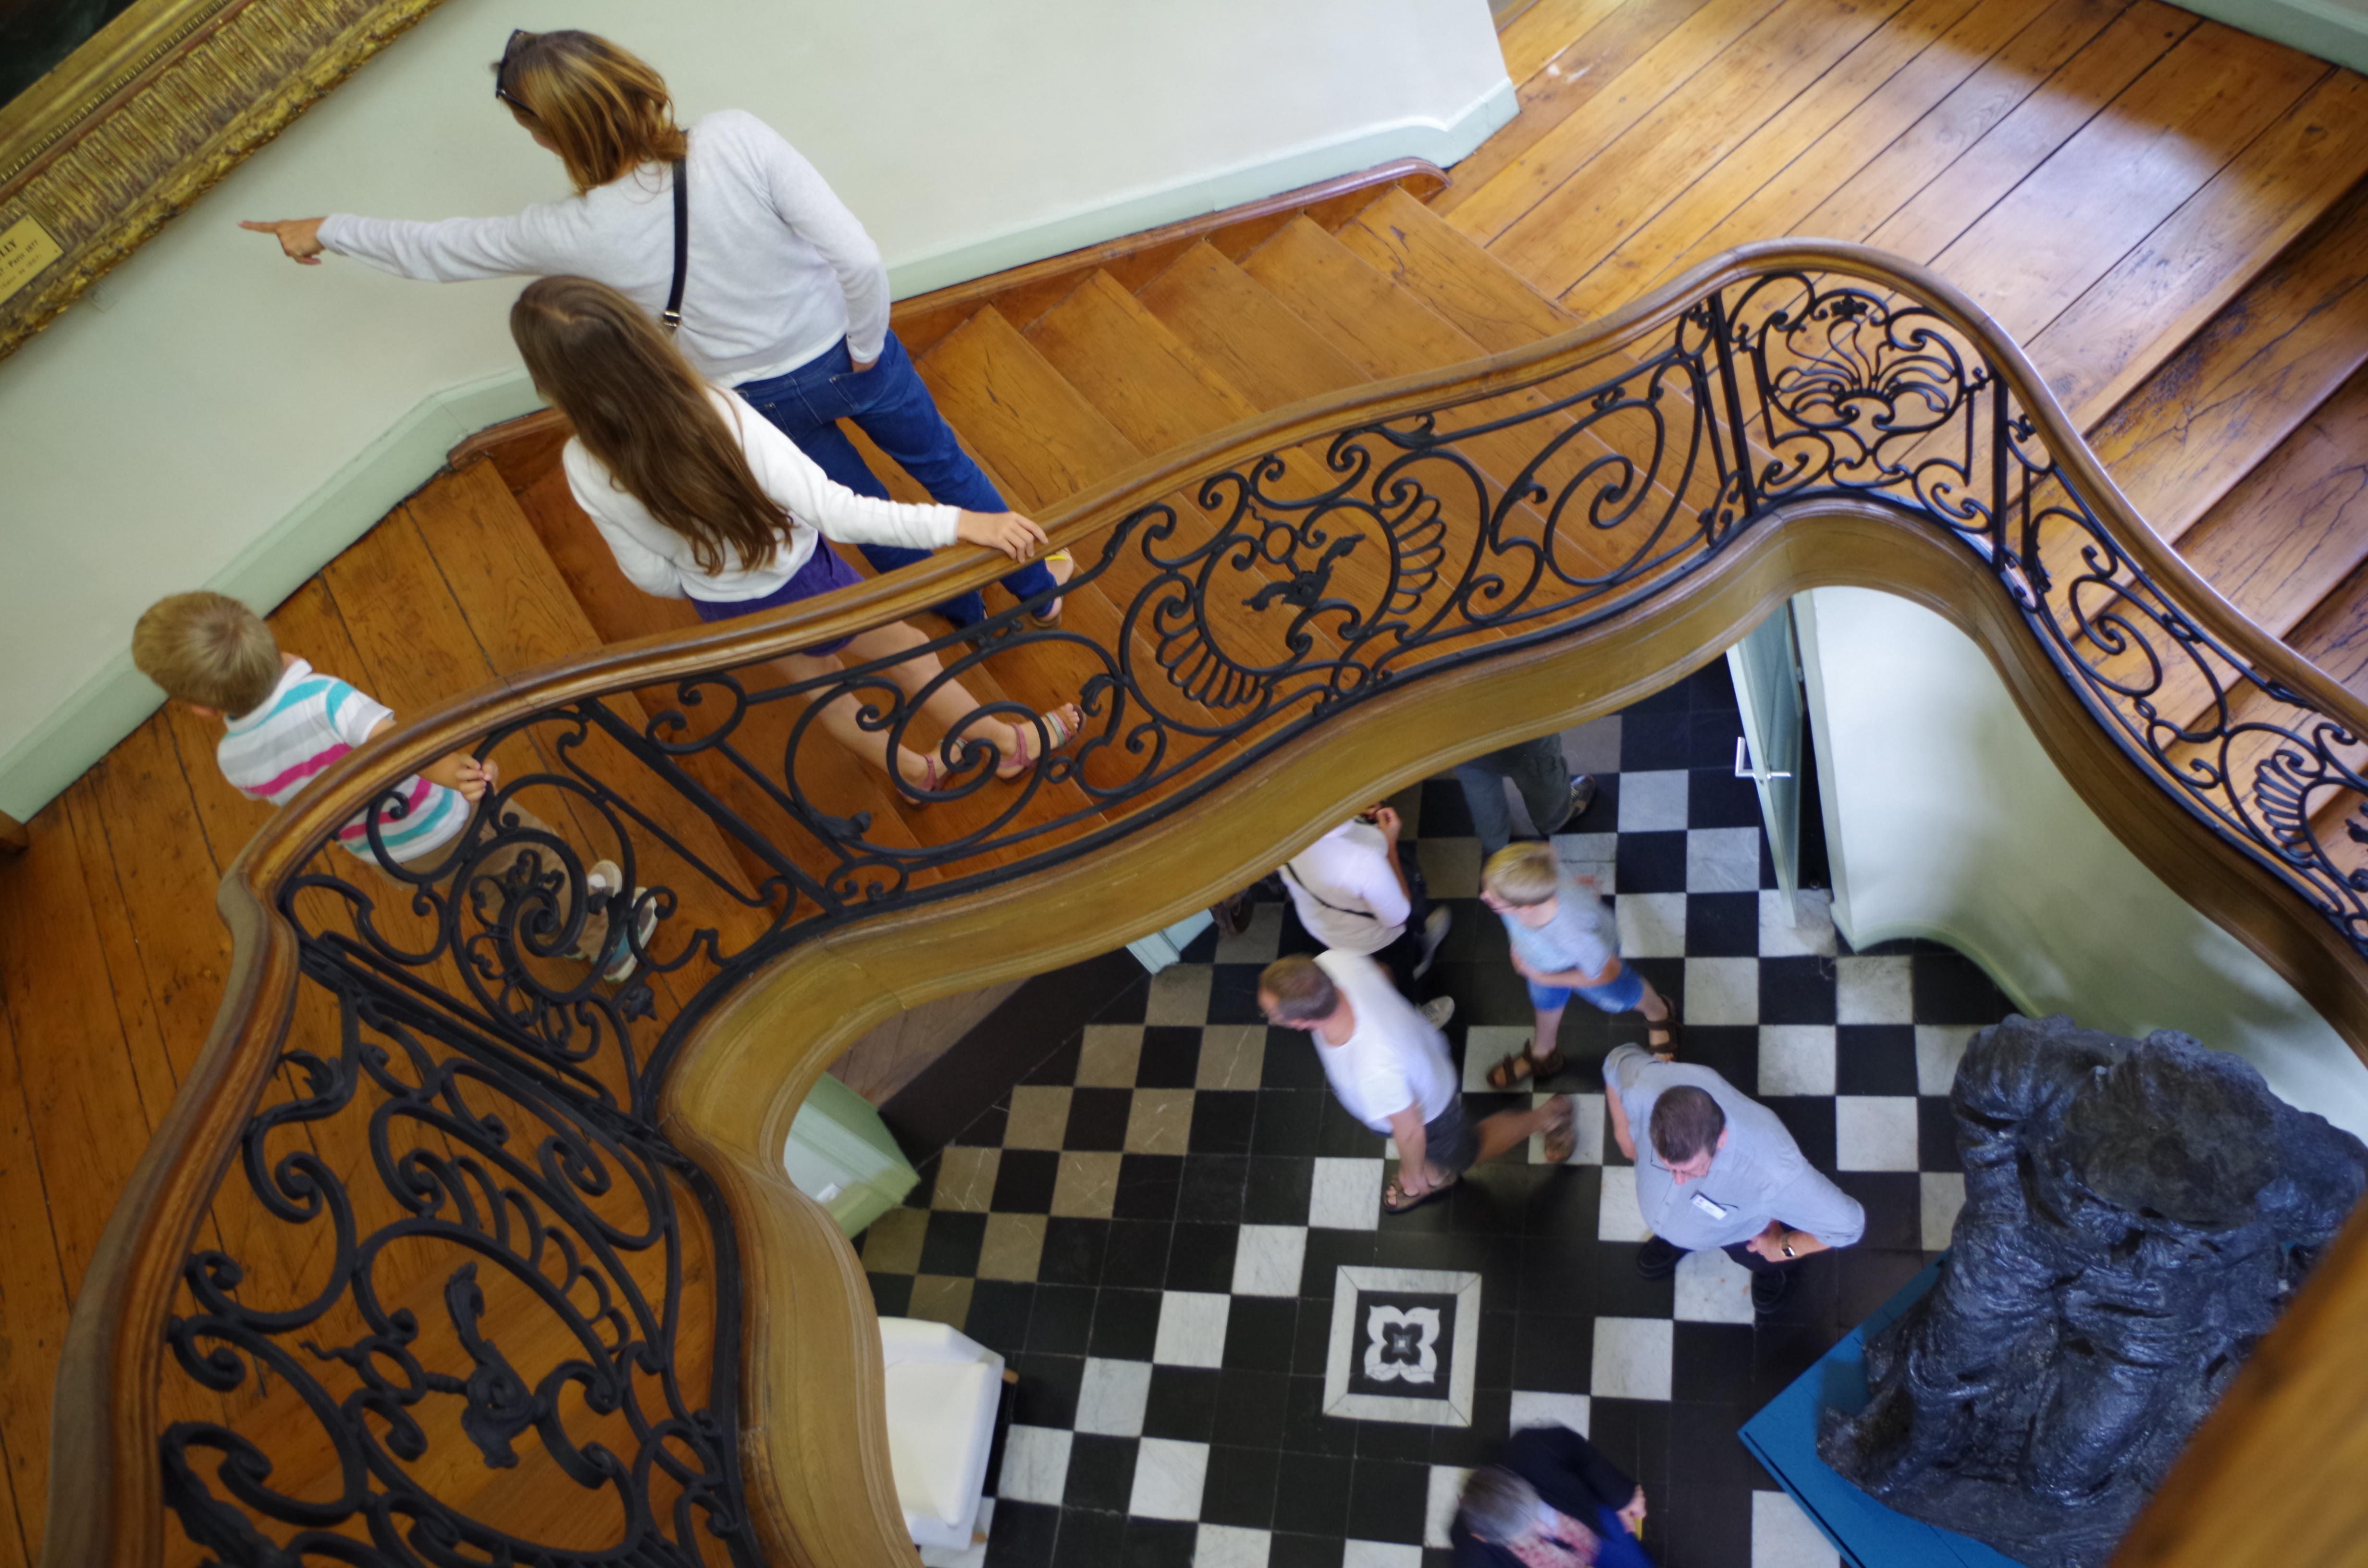 Visiteurs au musée Sandelin